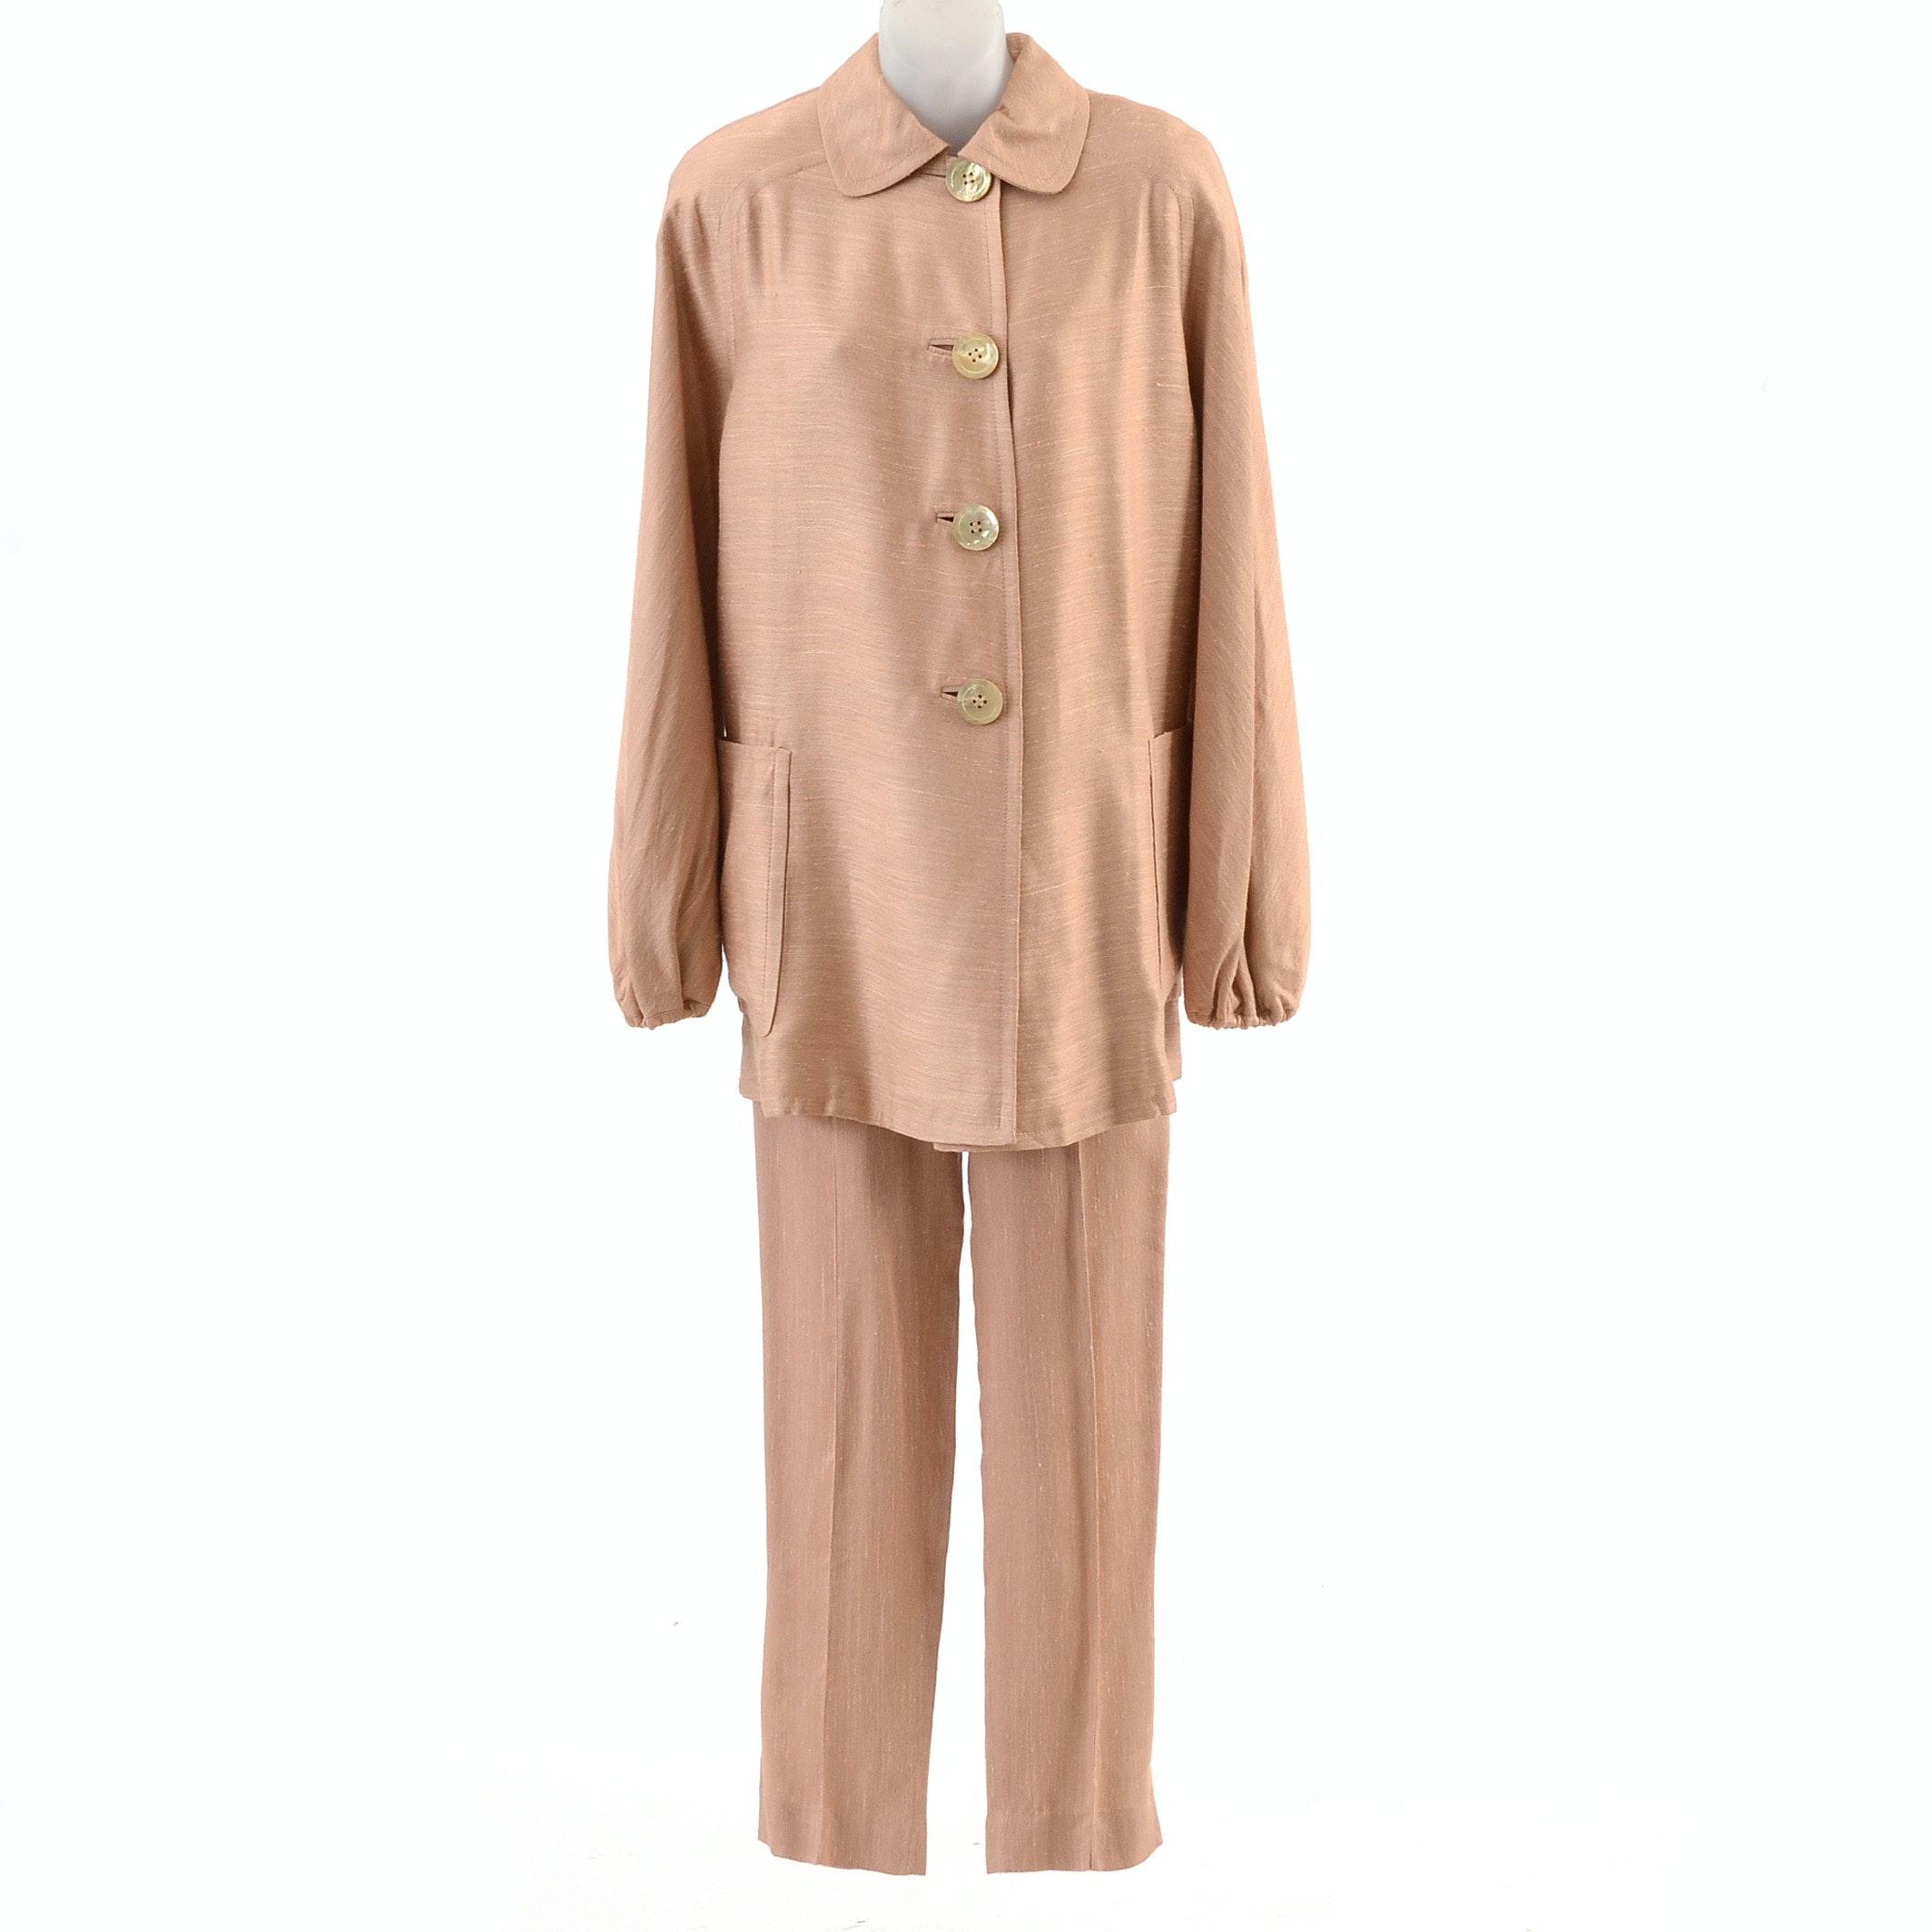 1980s Gianfranco Ferre Studio Blush Rayon Blend Pant Suit